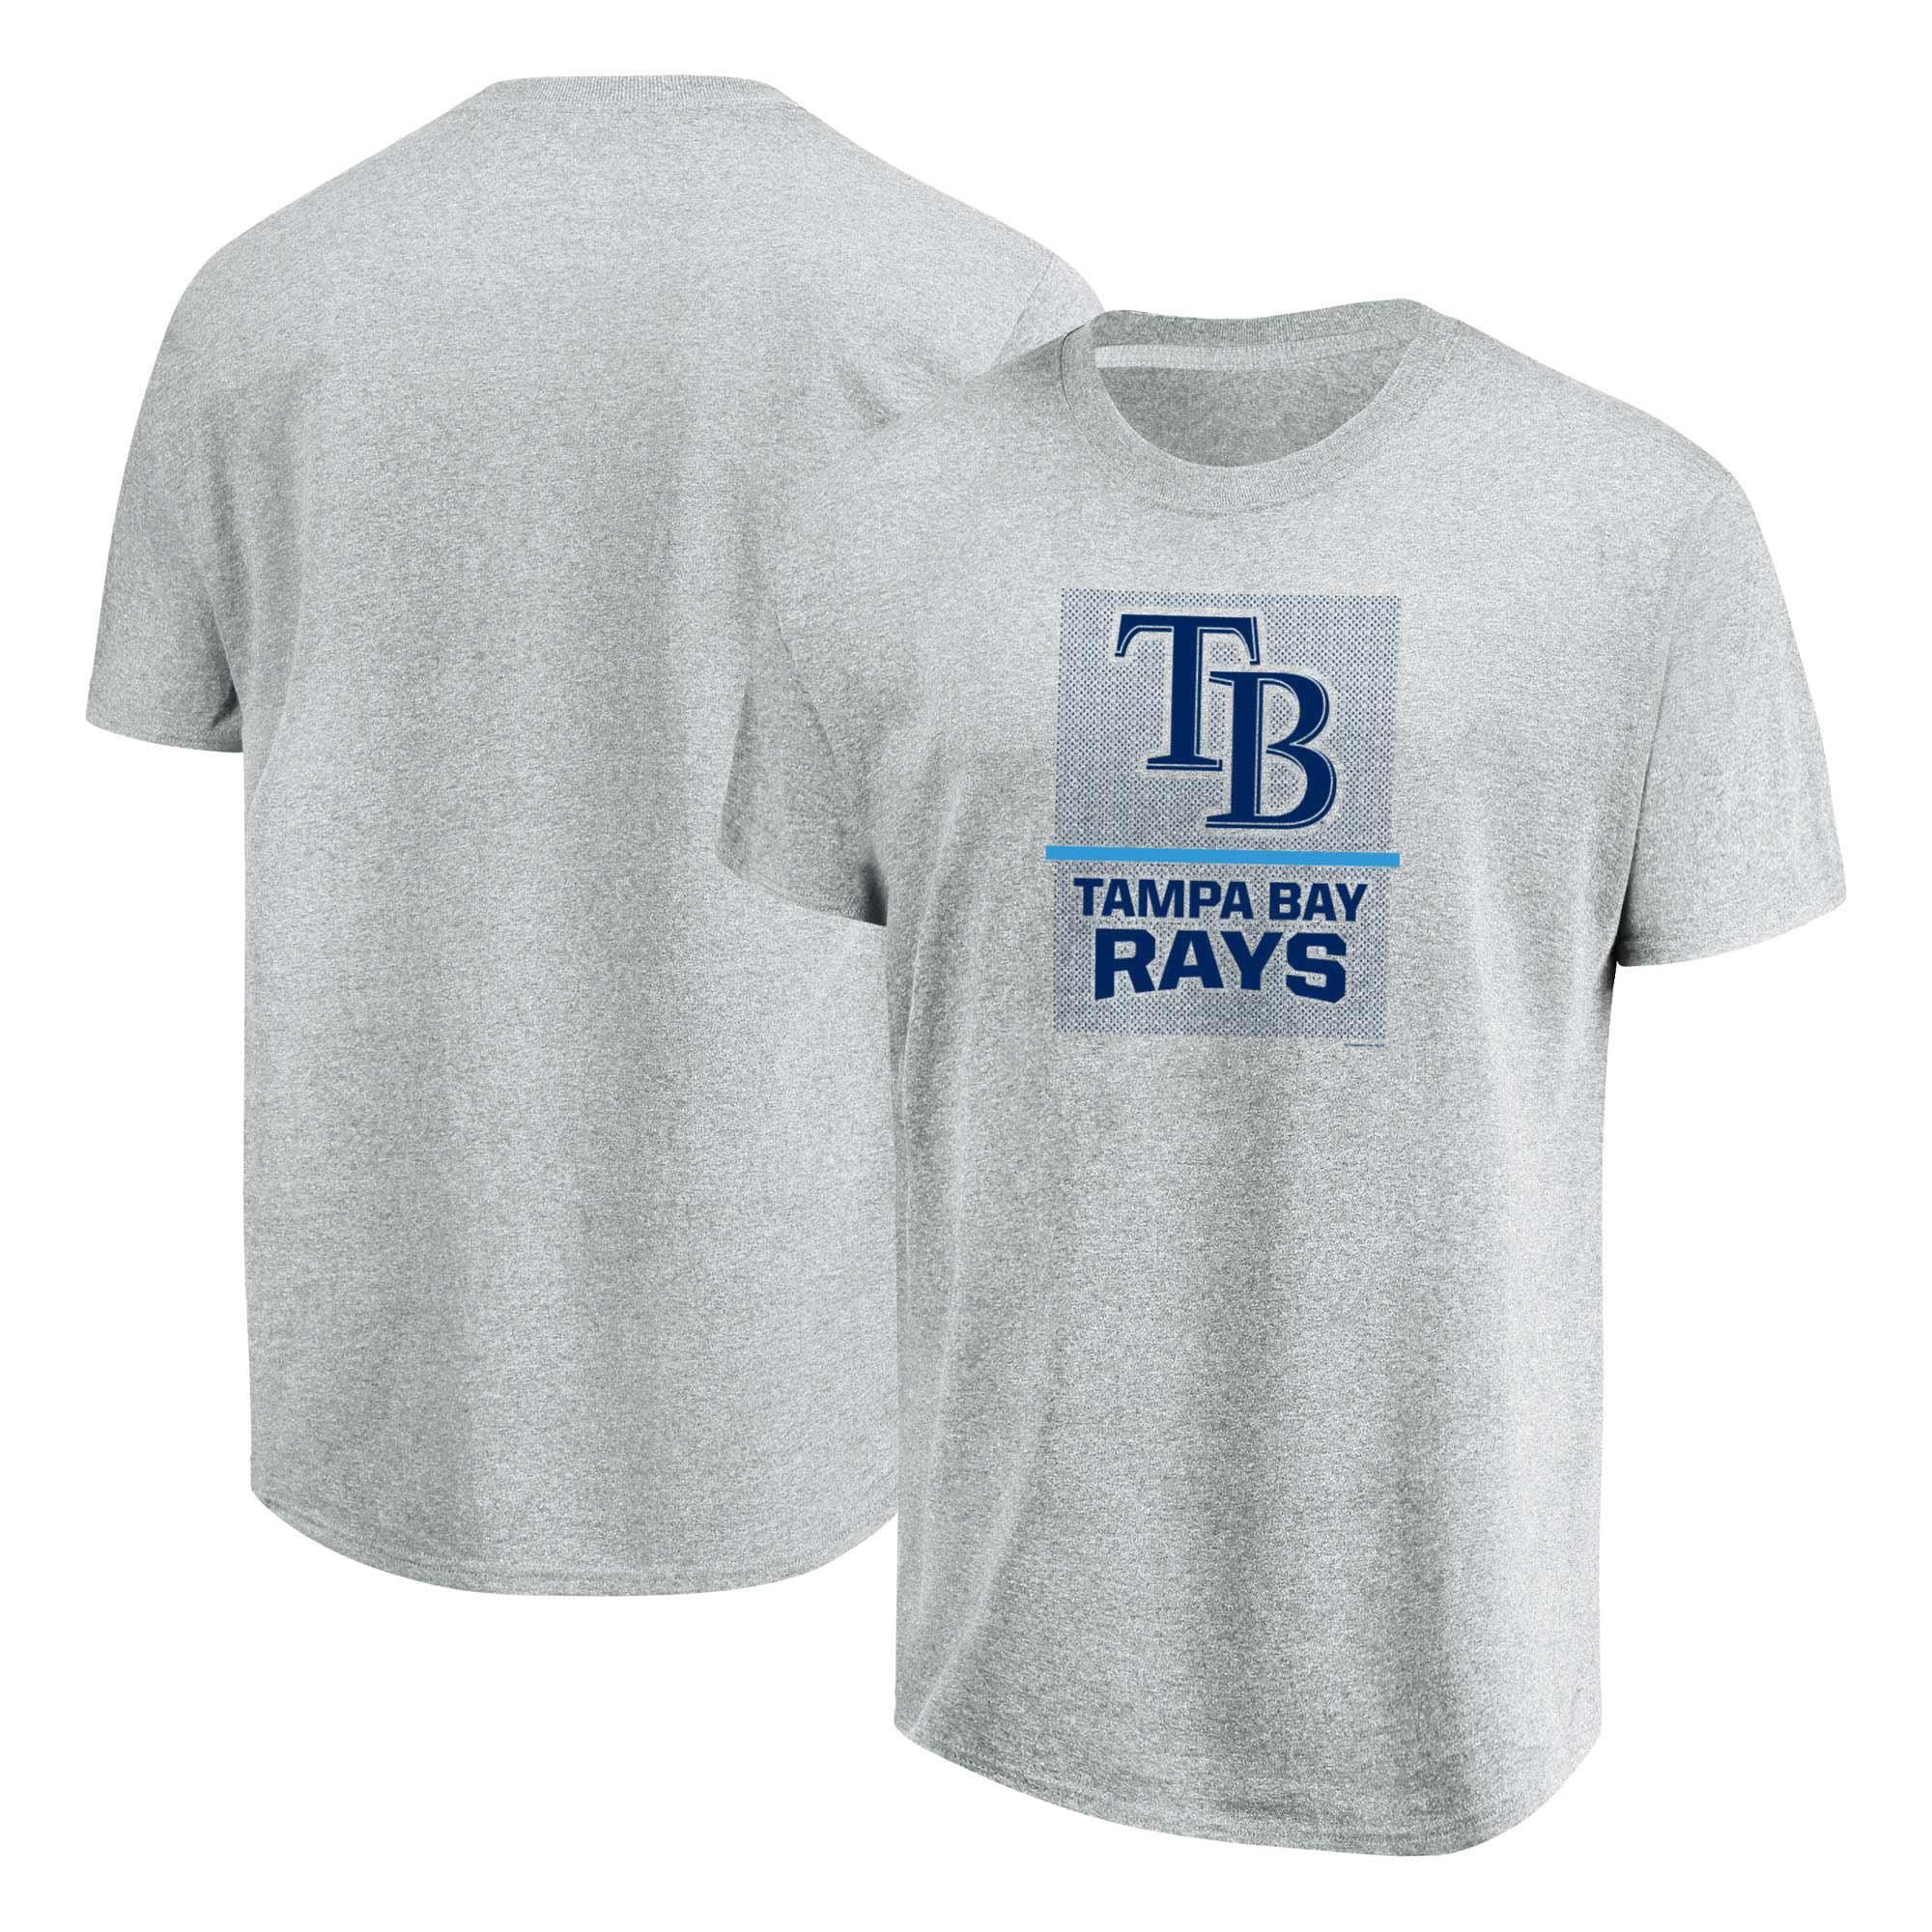 Tampa Bay Rays Majestic Flying High Big & Tall T-Shirt - Heathered Gray